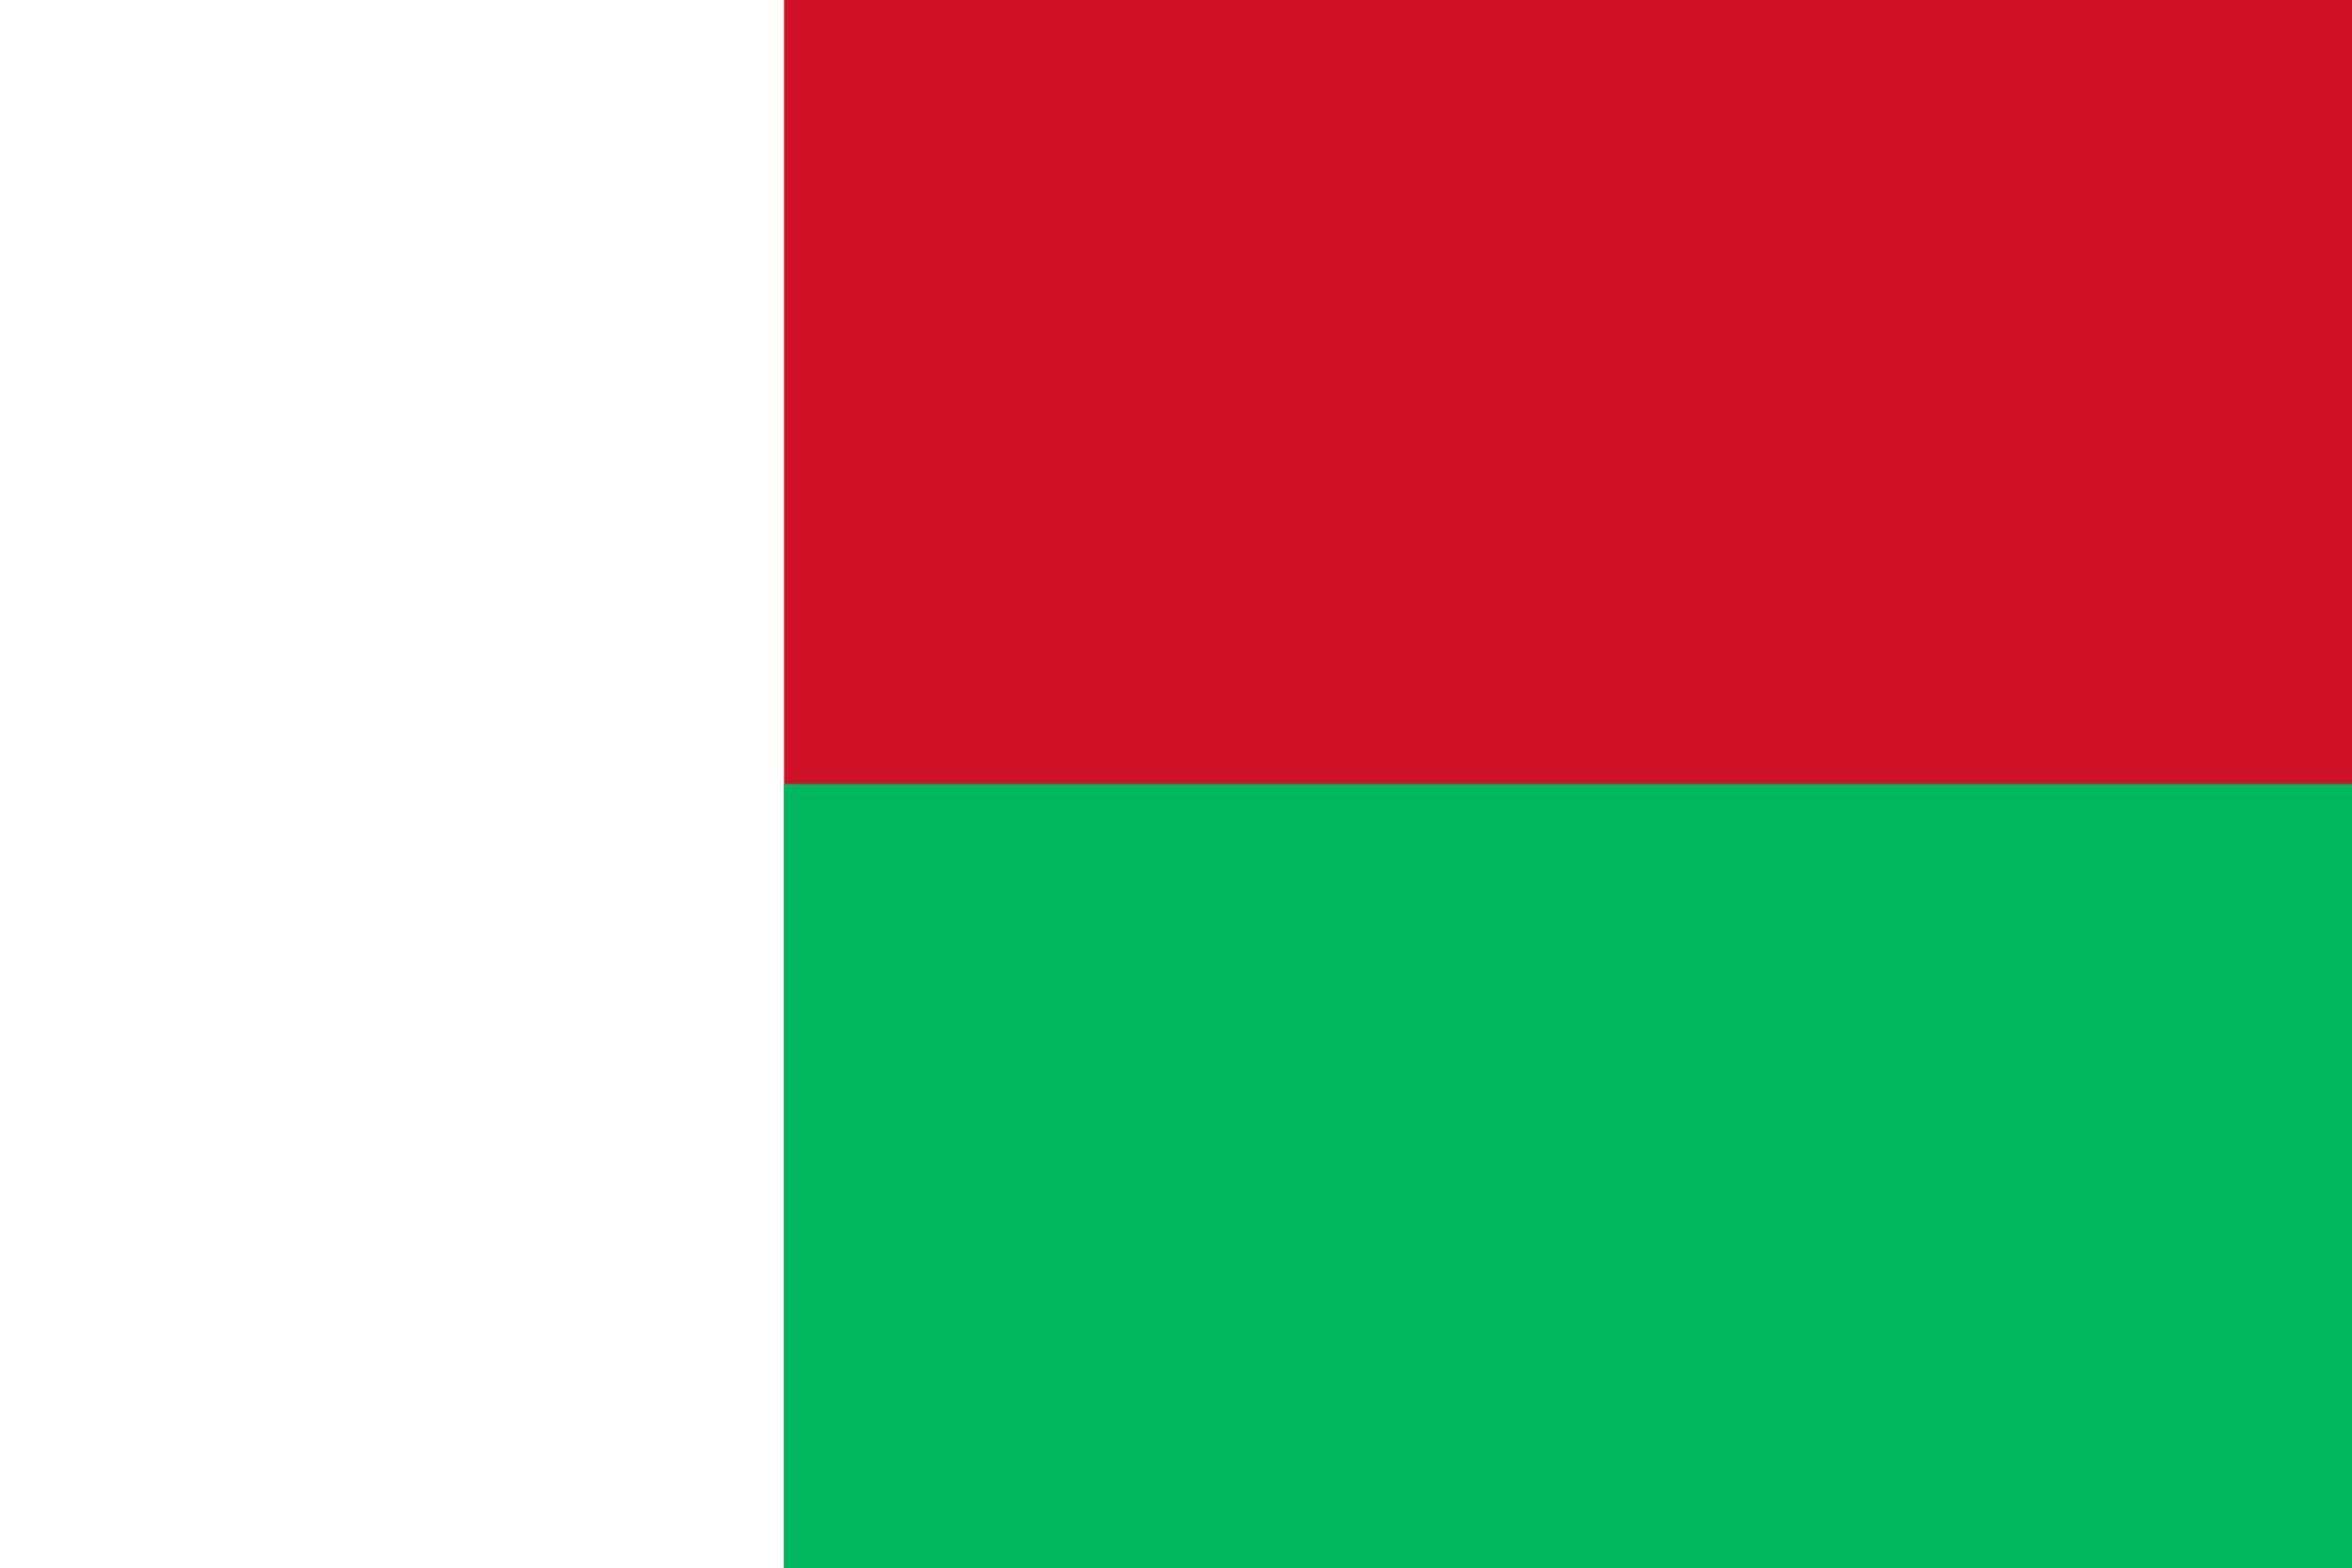 madagascar, país, emblema, insignia, símbolo - Fondos de Pantalla HD - professor-falken.com